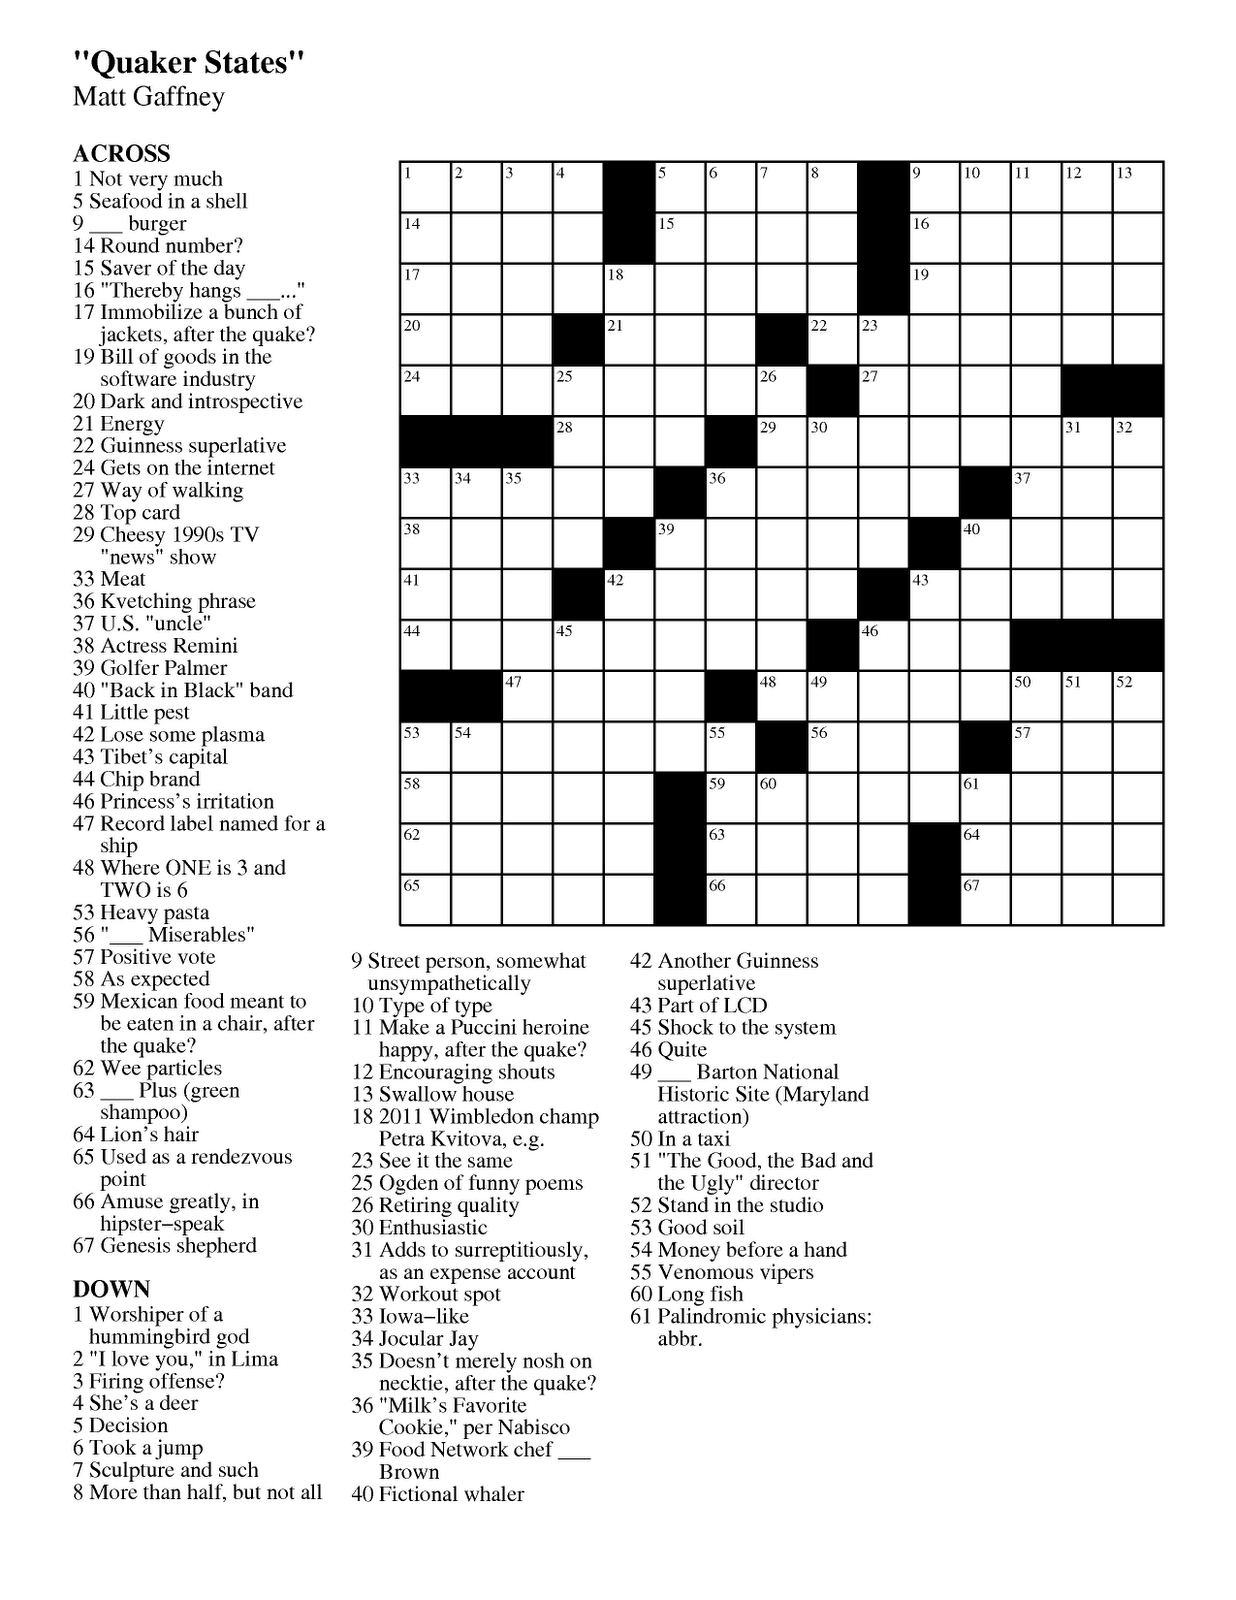 Free Printable Large Print Crossword Puzzles | M3U8 - Simple Crossword Puzzles Printable Pdf